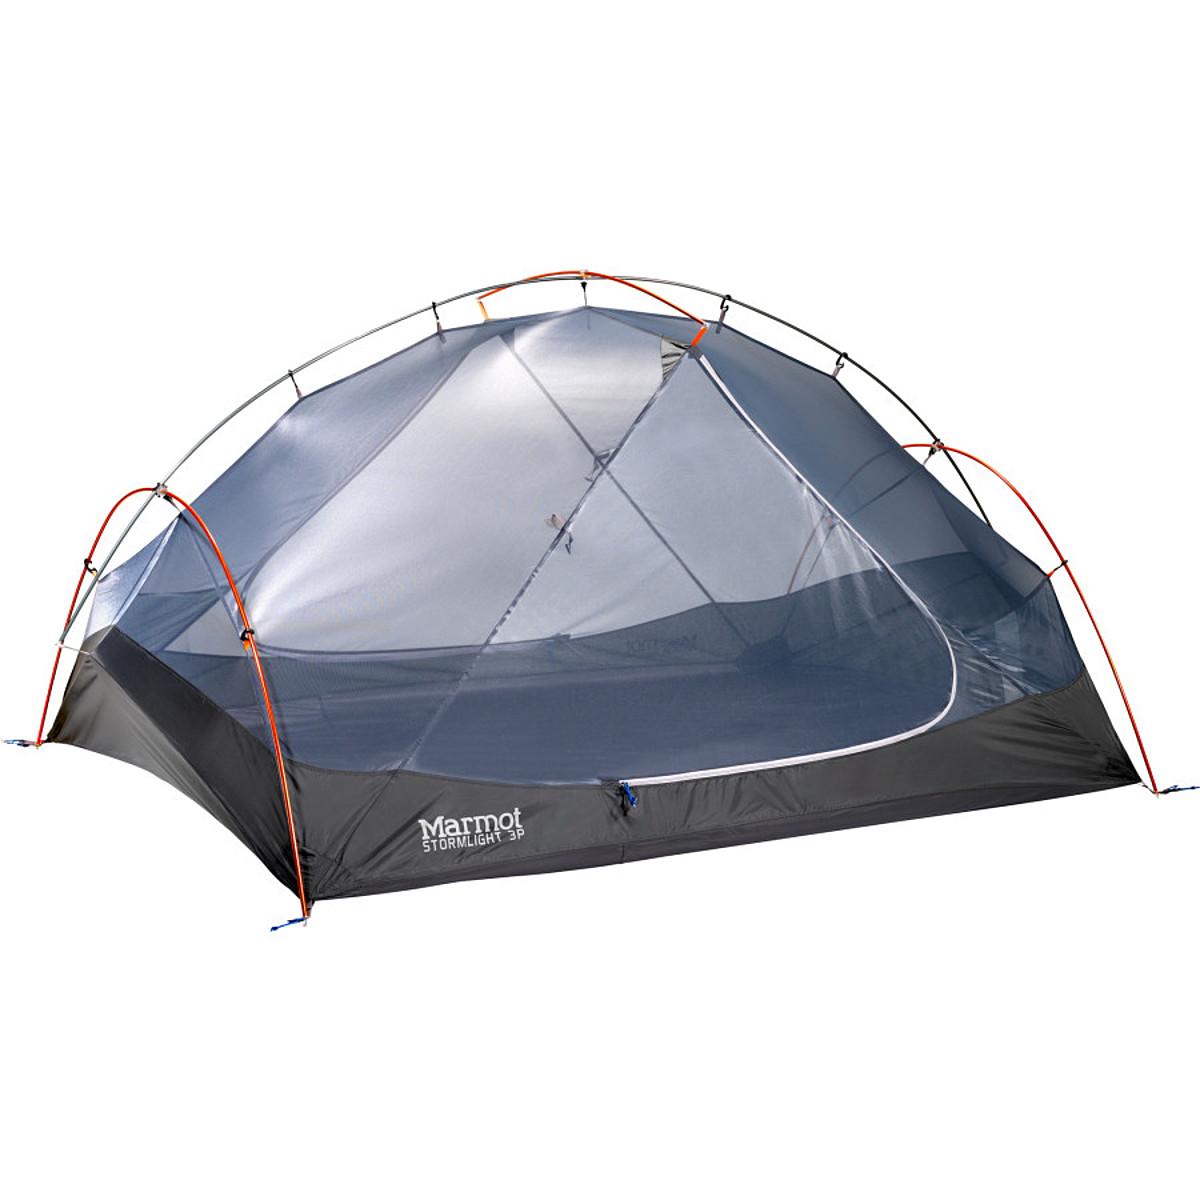 photo: Marmot Stormlight 3P three-season tent